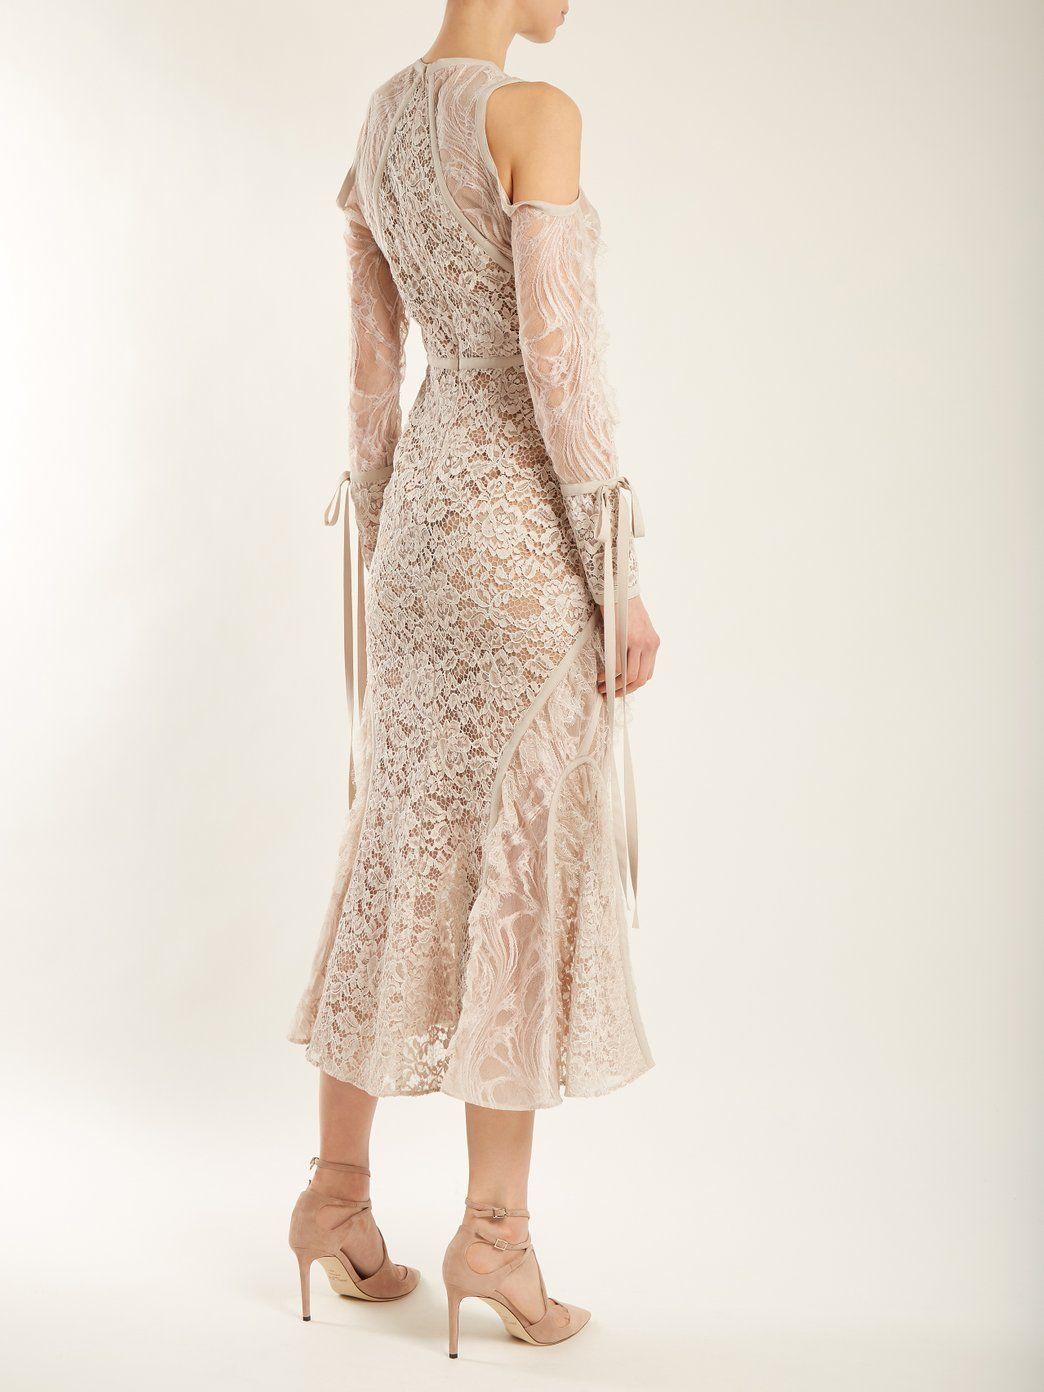 Fluted-hem floral-lace dress Elie Saab LXiE0cN1